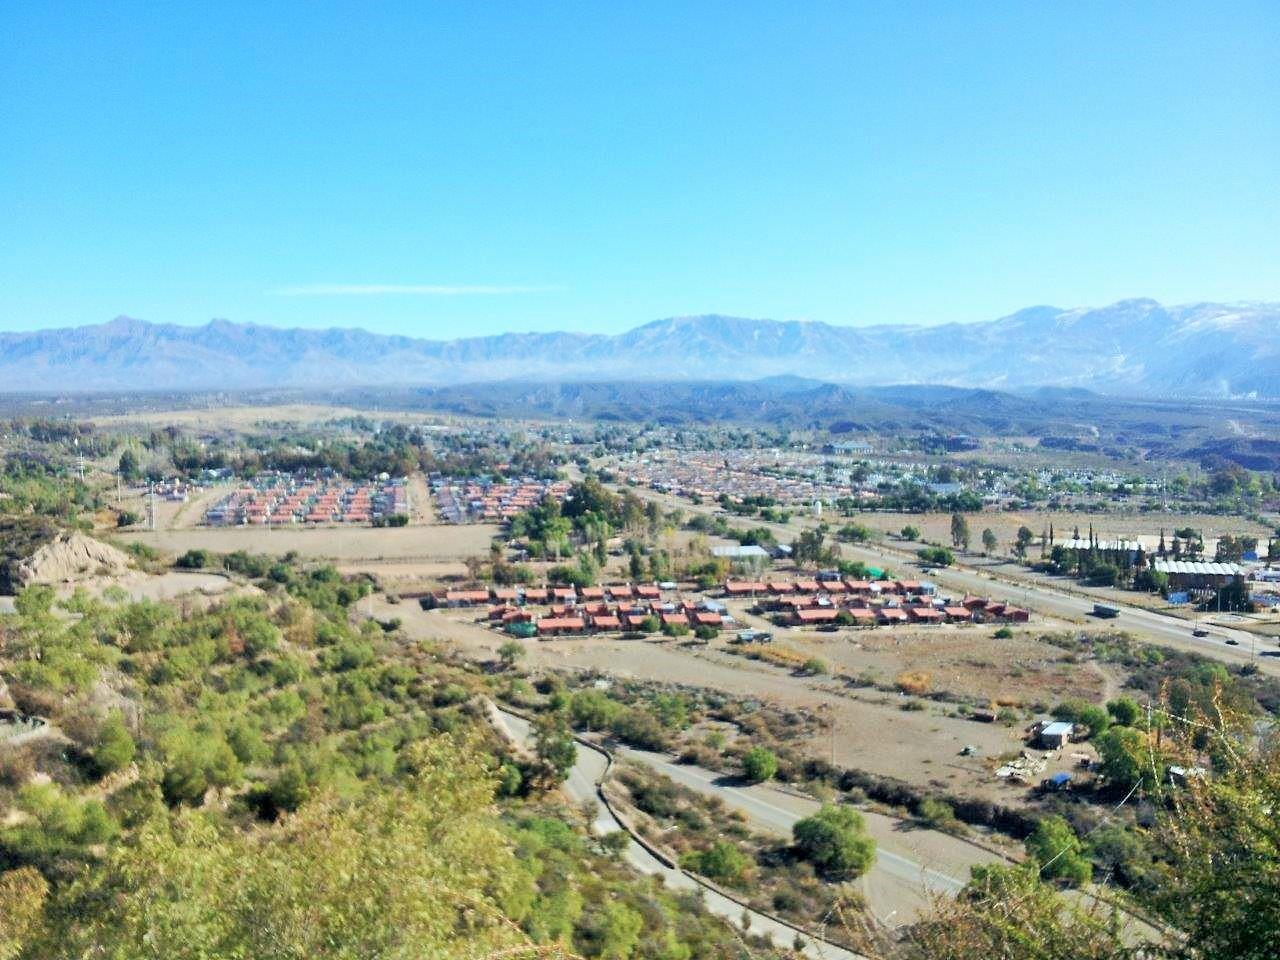 Mendoza skyline